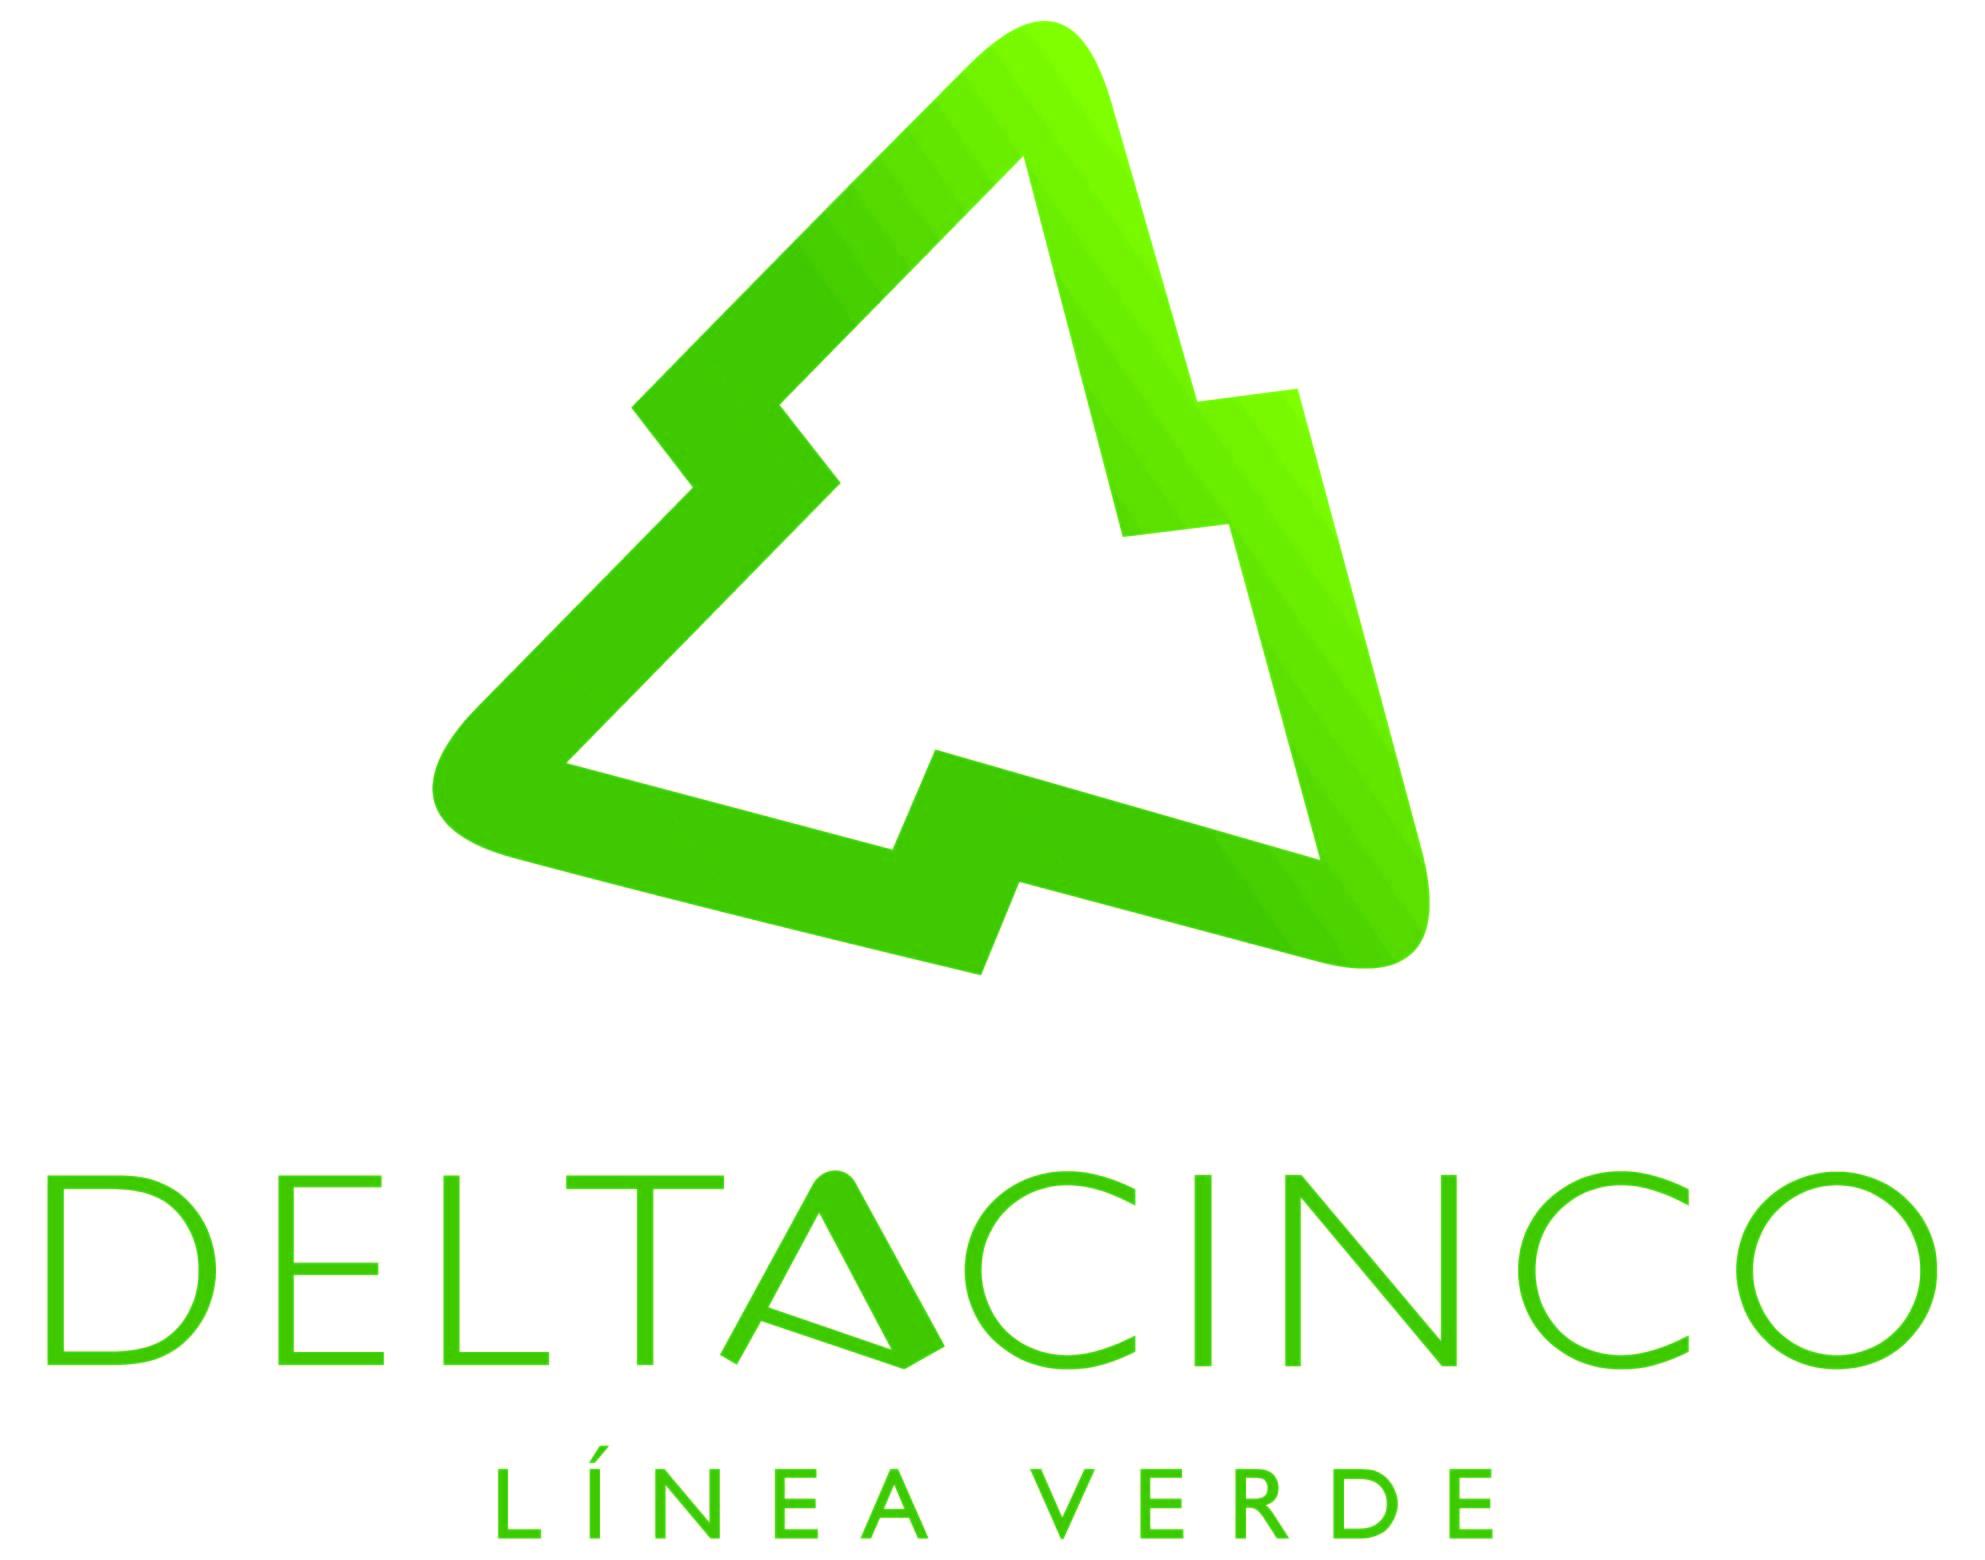 DELTACINCO LINEA VERDE